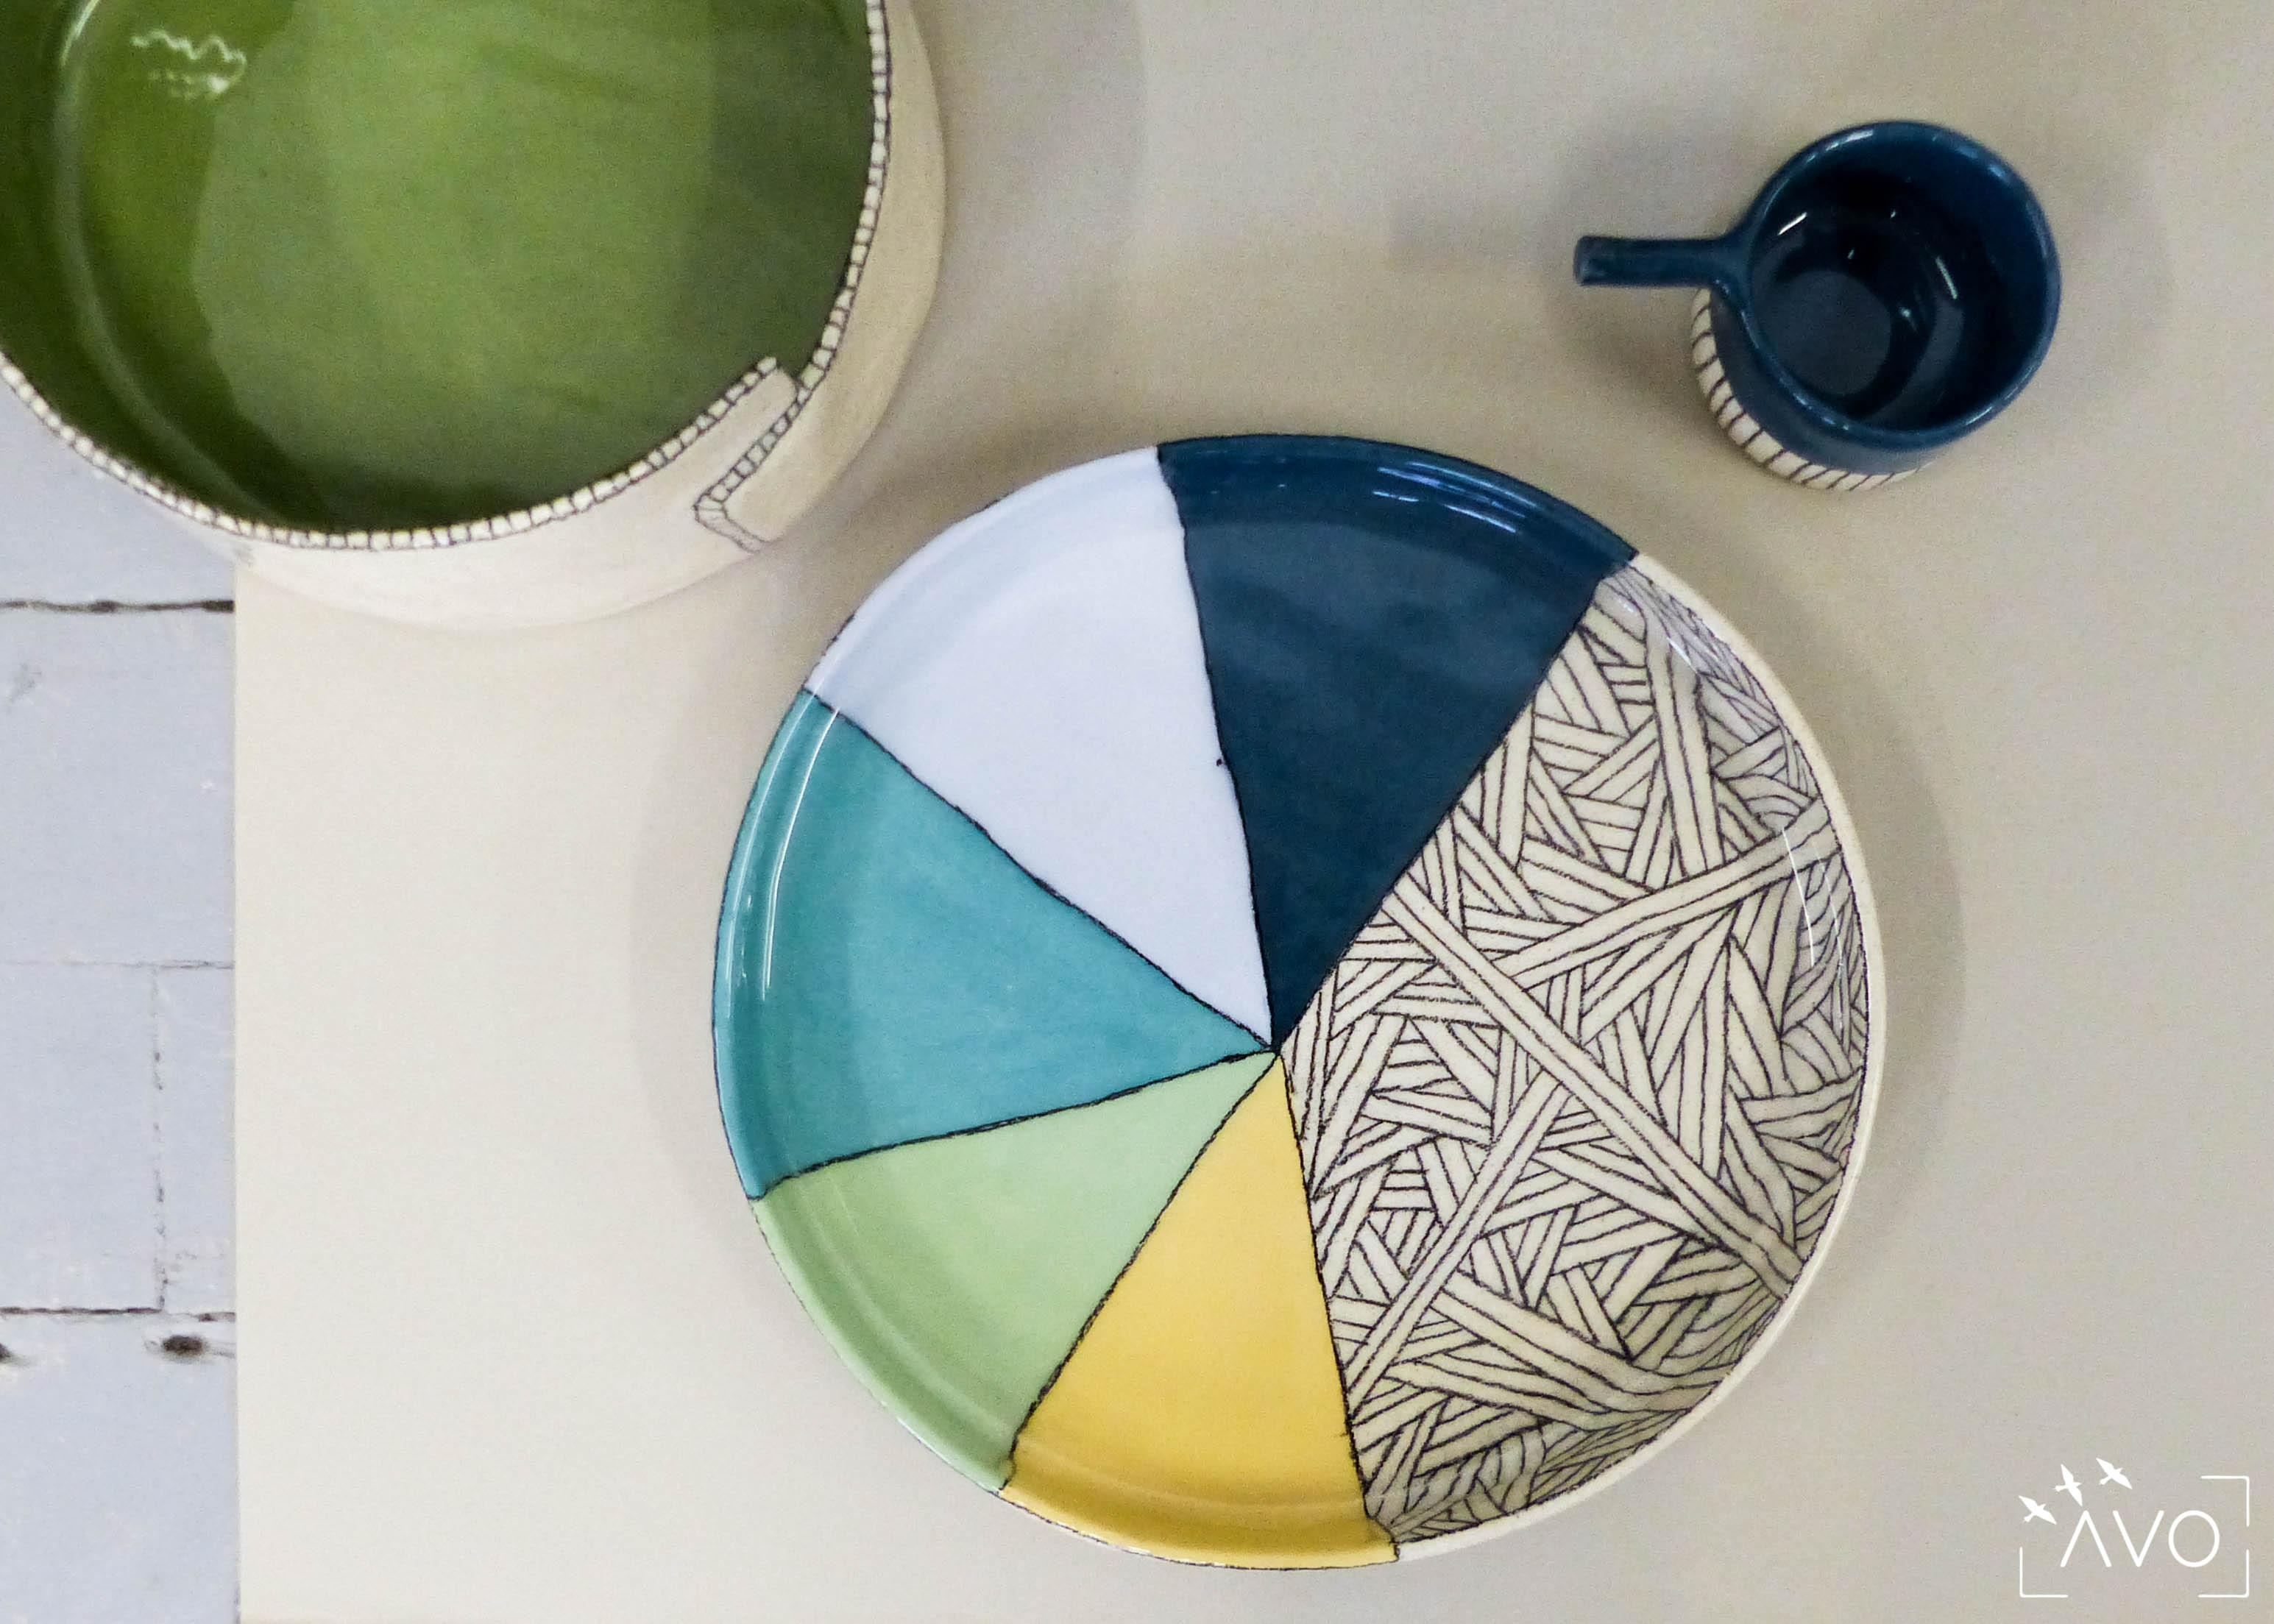 savoir-faire-ceramique-faience-decoration-bol-plat-creatrice-colore-email-terre-local-sabine-orlandini